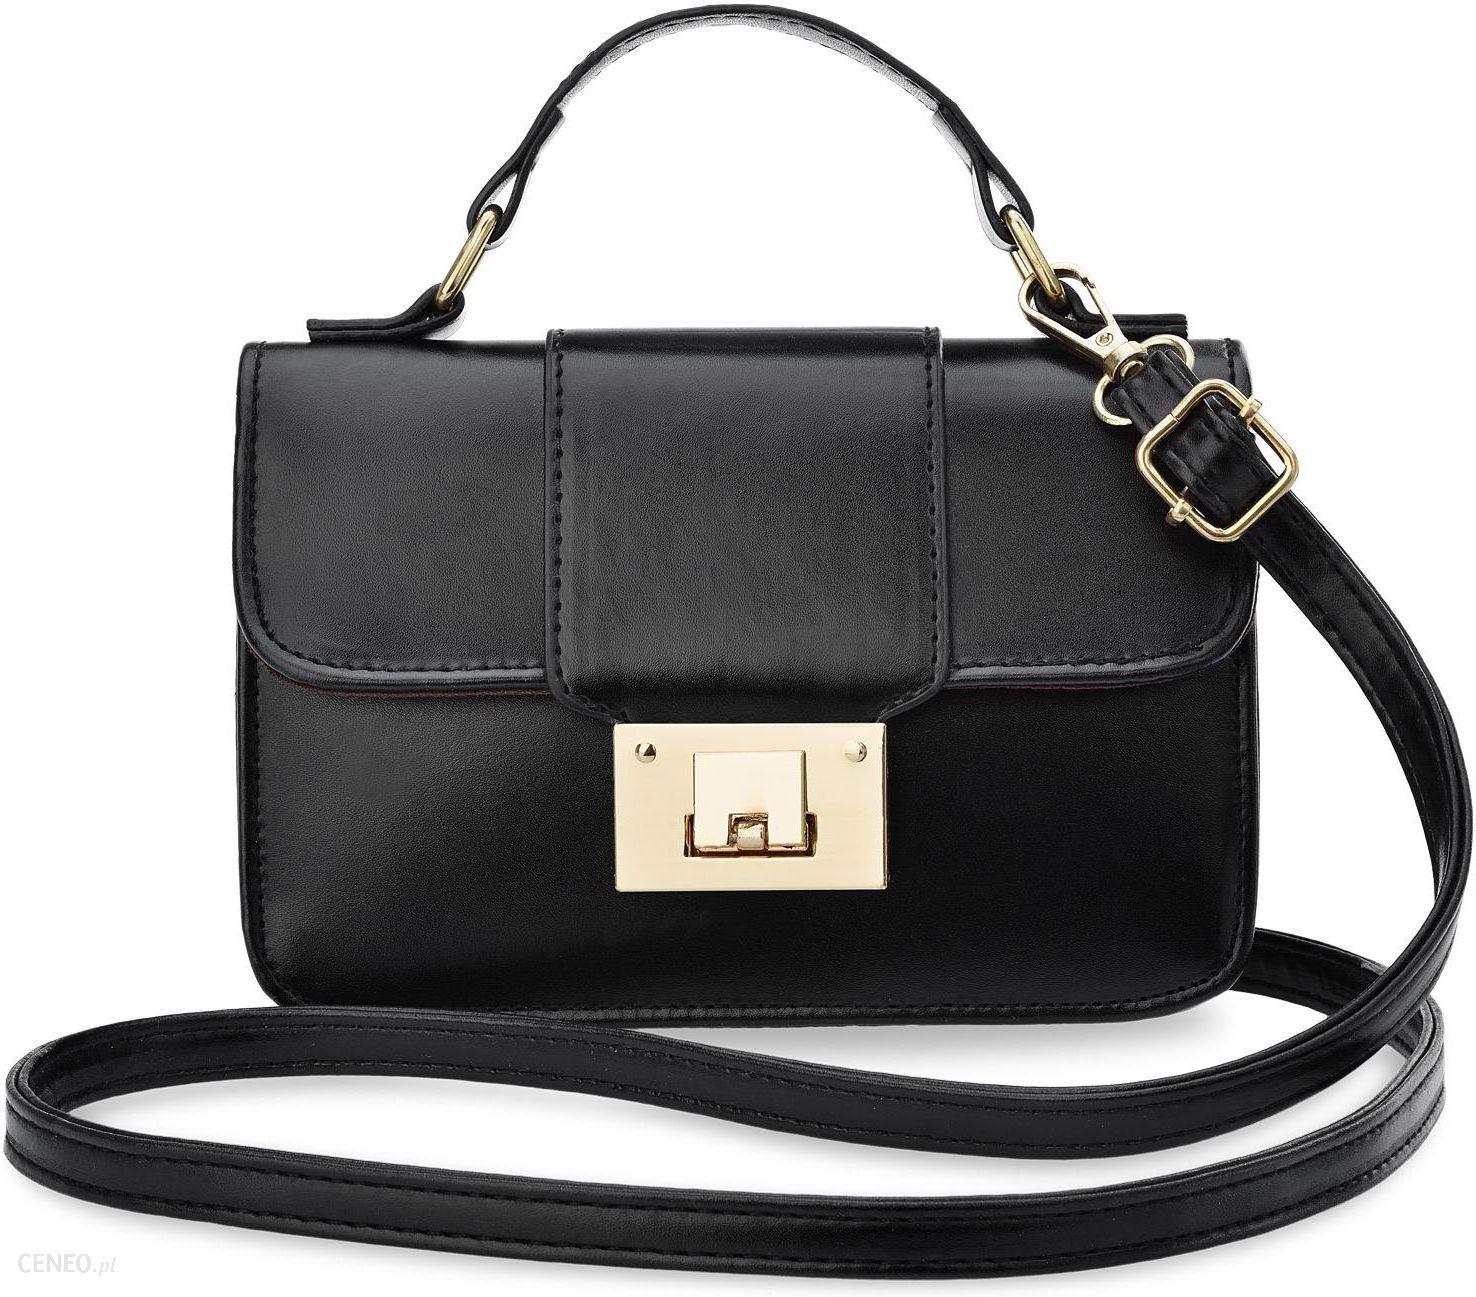 b59122888fc6a Elegancka klasyczna listonoszka zarka kuferek do ręki i na ramię torebka  damska z klapą i klamrą